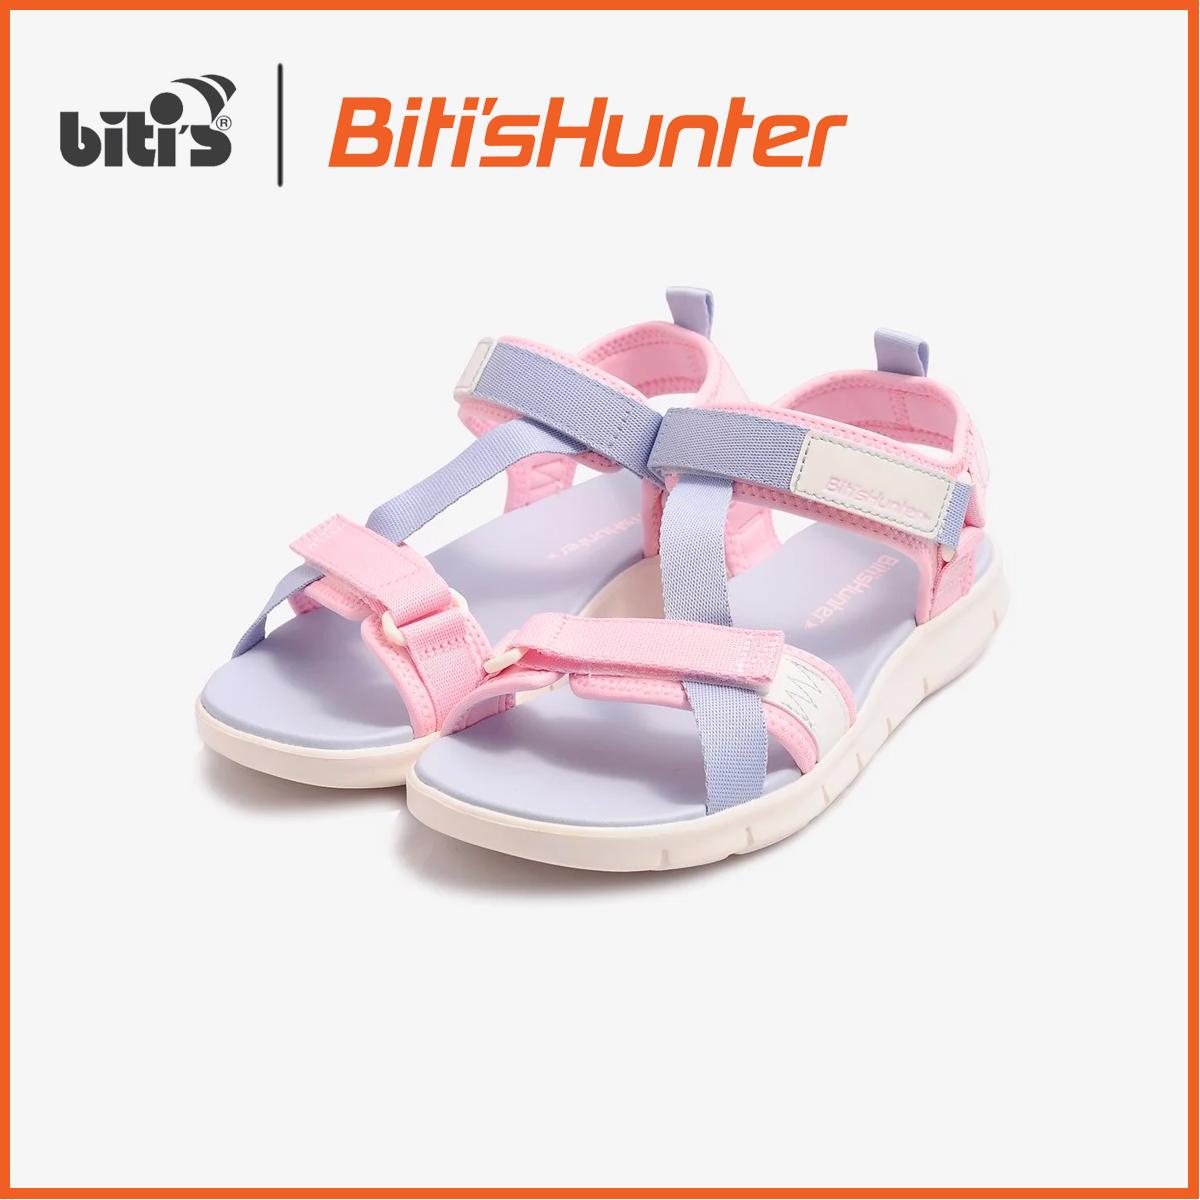 Sandal Nữ Biti's Hunter DEWH00500HOG (Hồng)